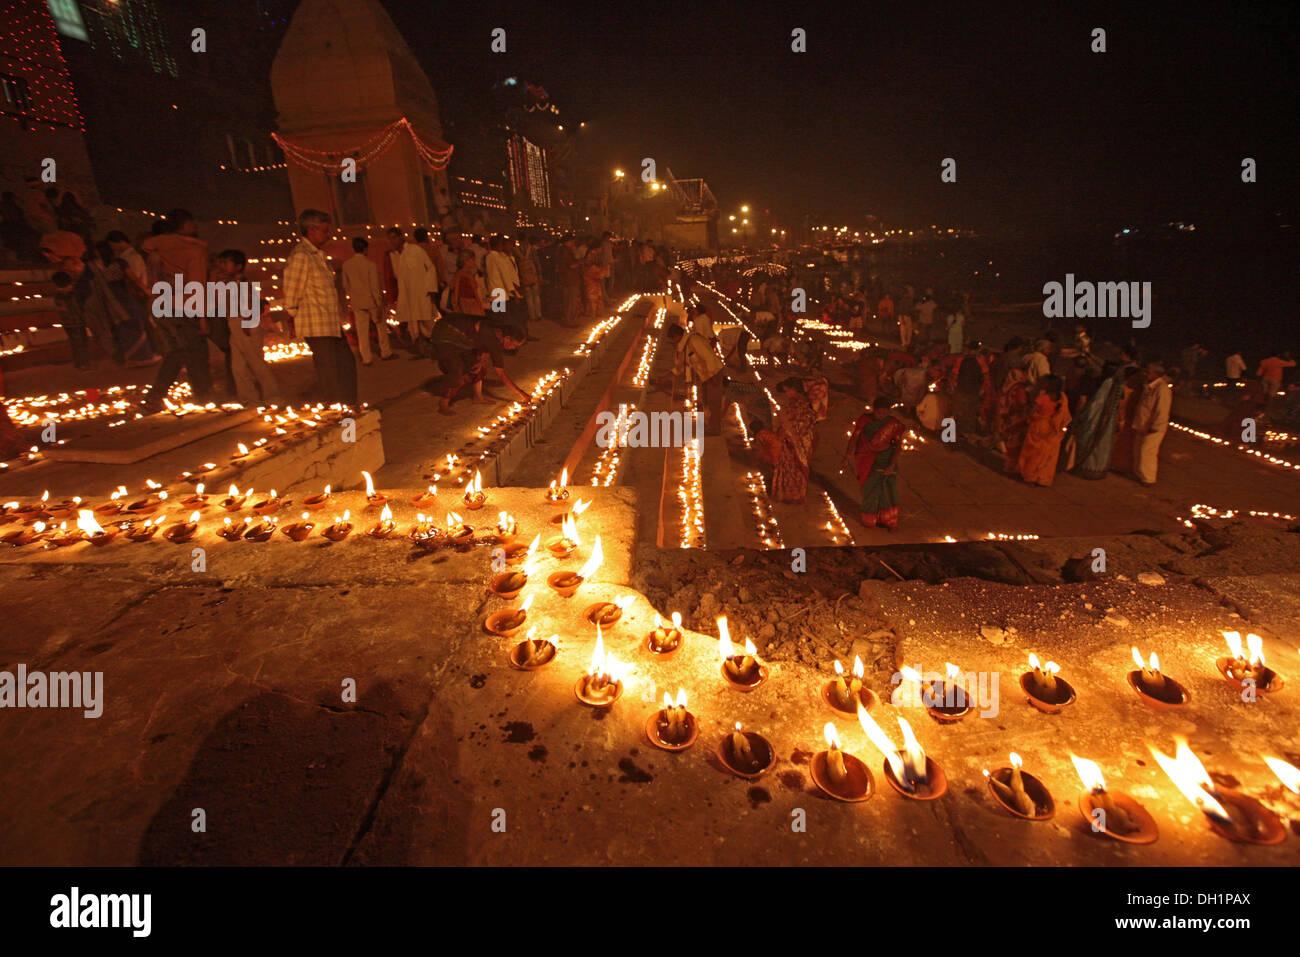 Night lamps india - Earthen Oil Lamps Lit To Celebrate Dev Deepavali On Ganga River At Varanasi Uttar Pradesh India